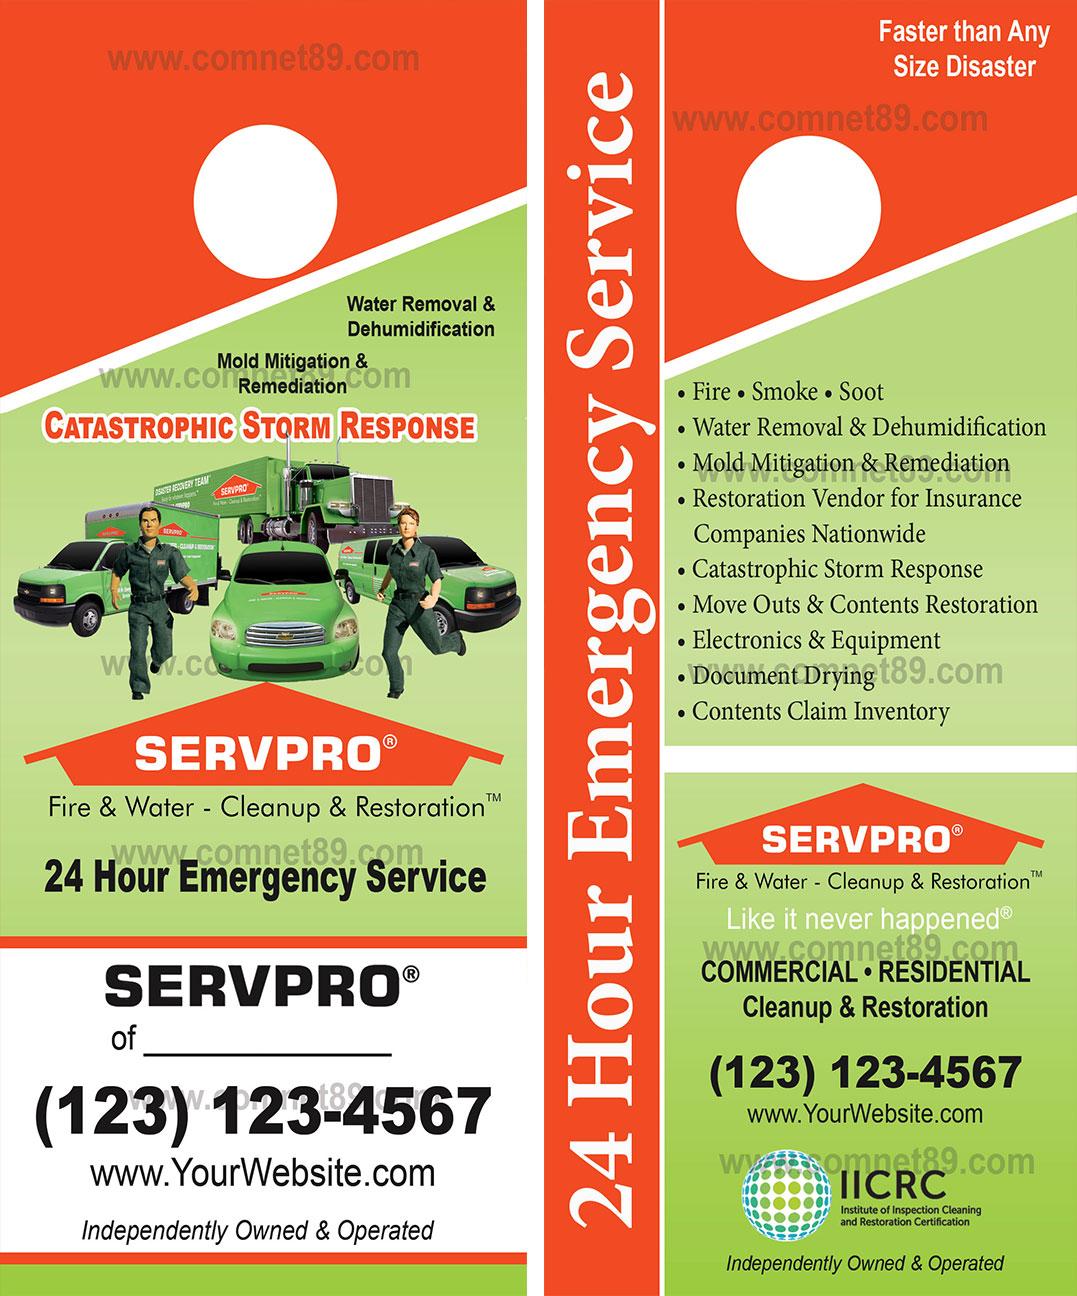 servpro-dh-1-both-h.jpg